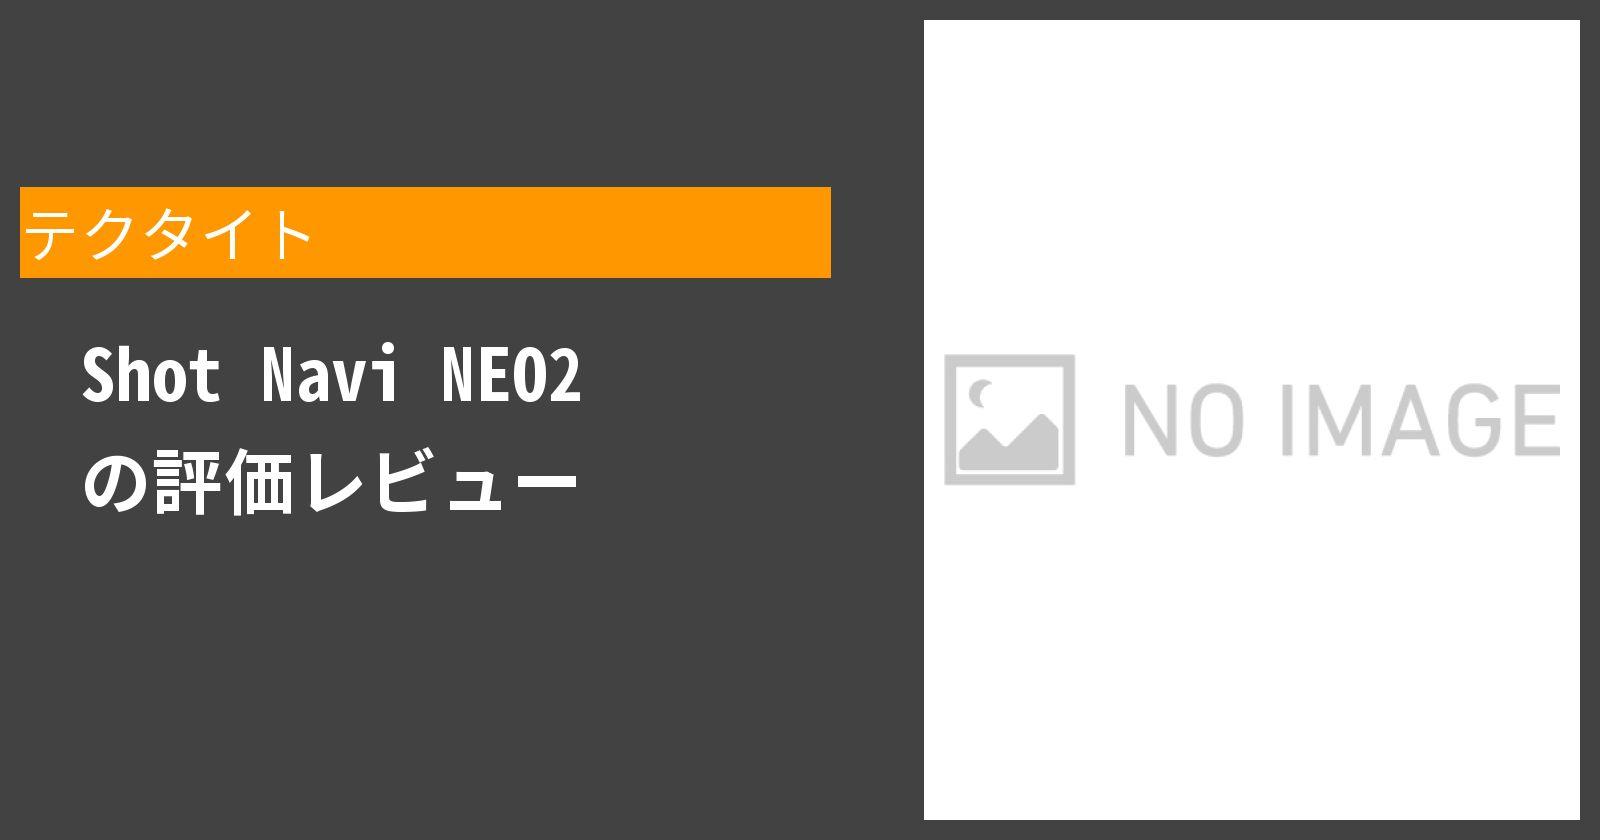 Shot Navi NEO2を徹底評価